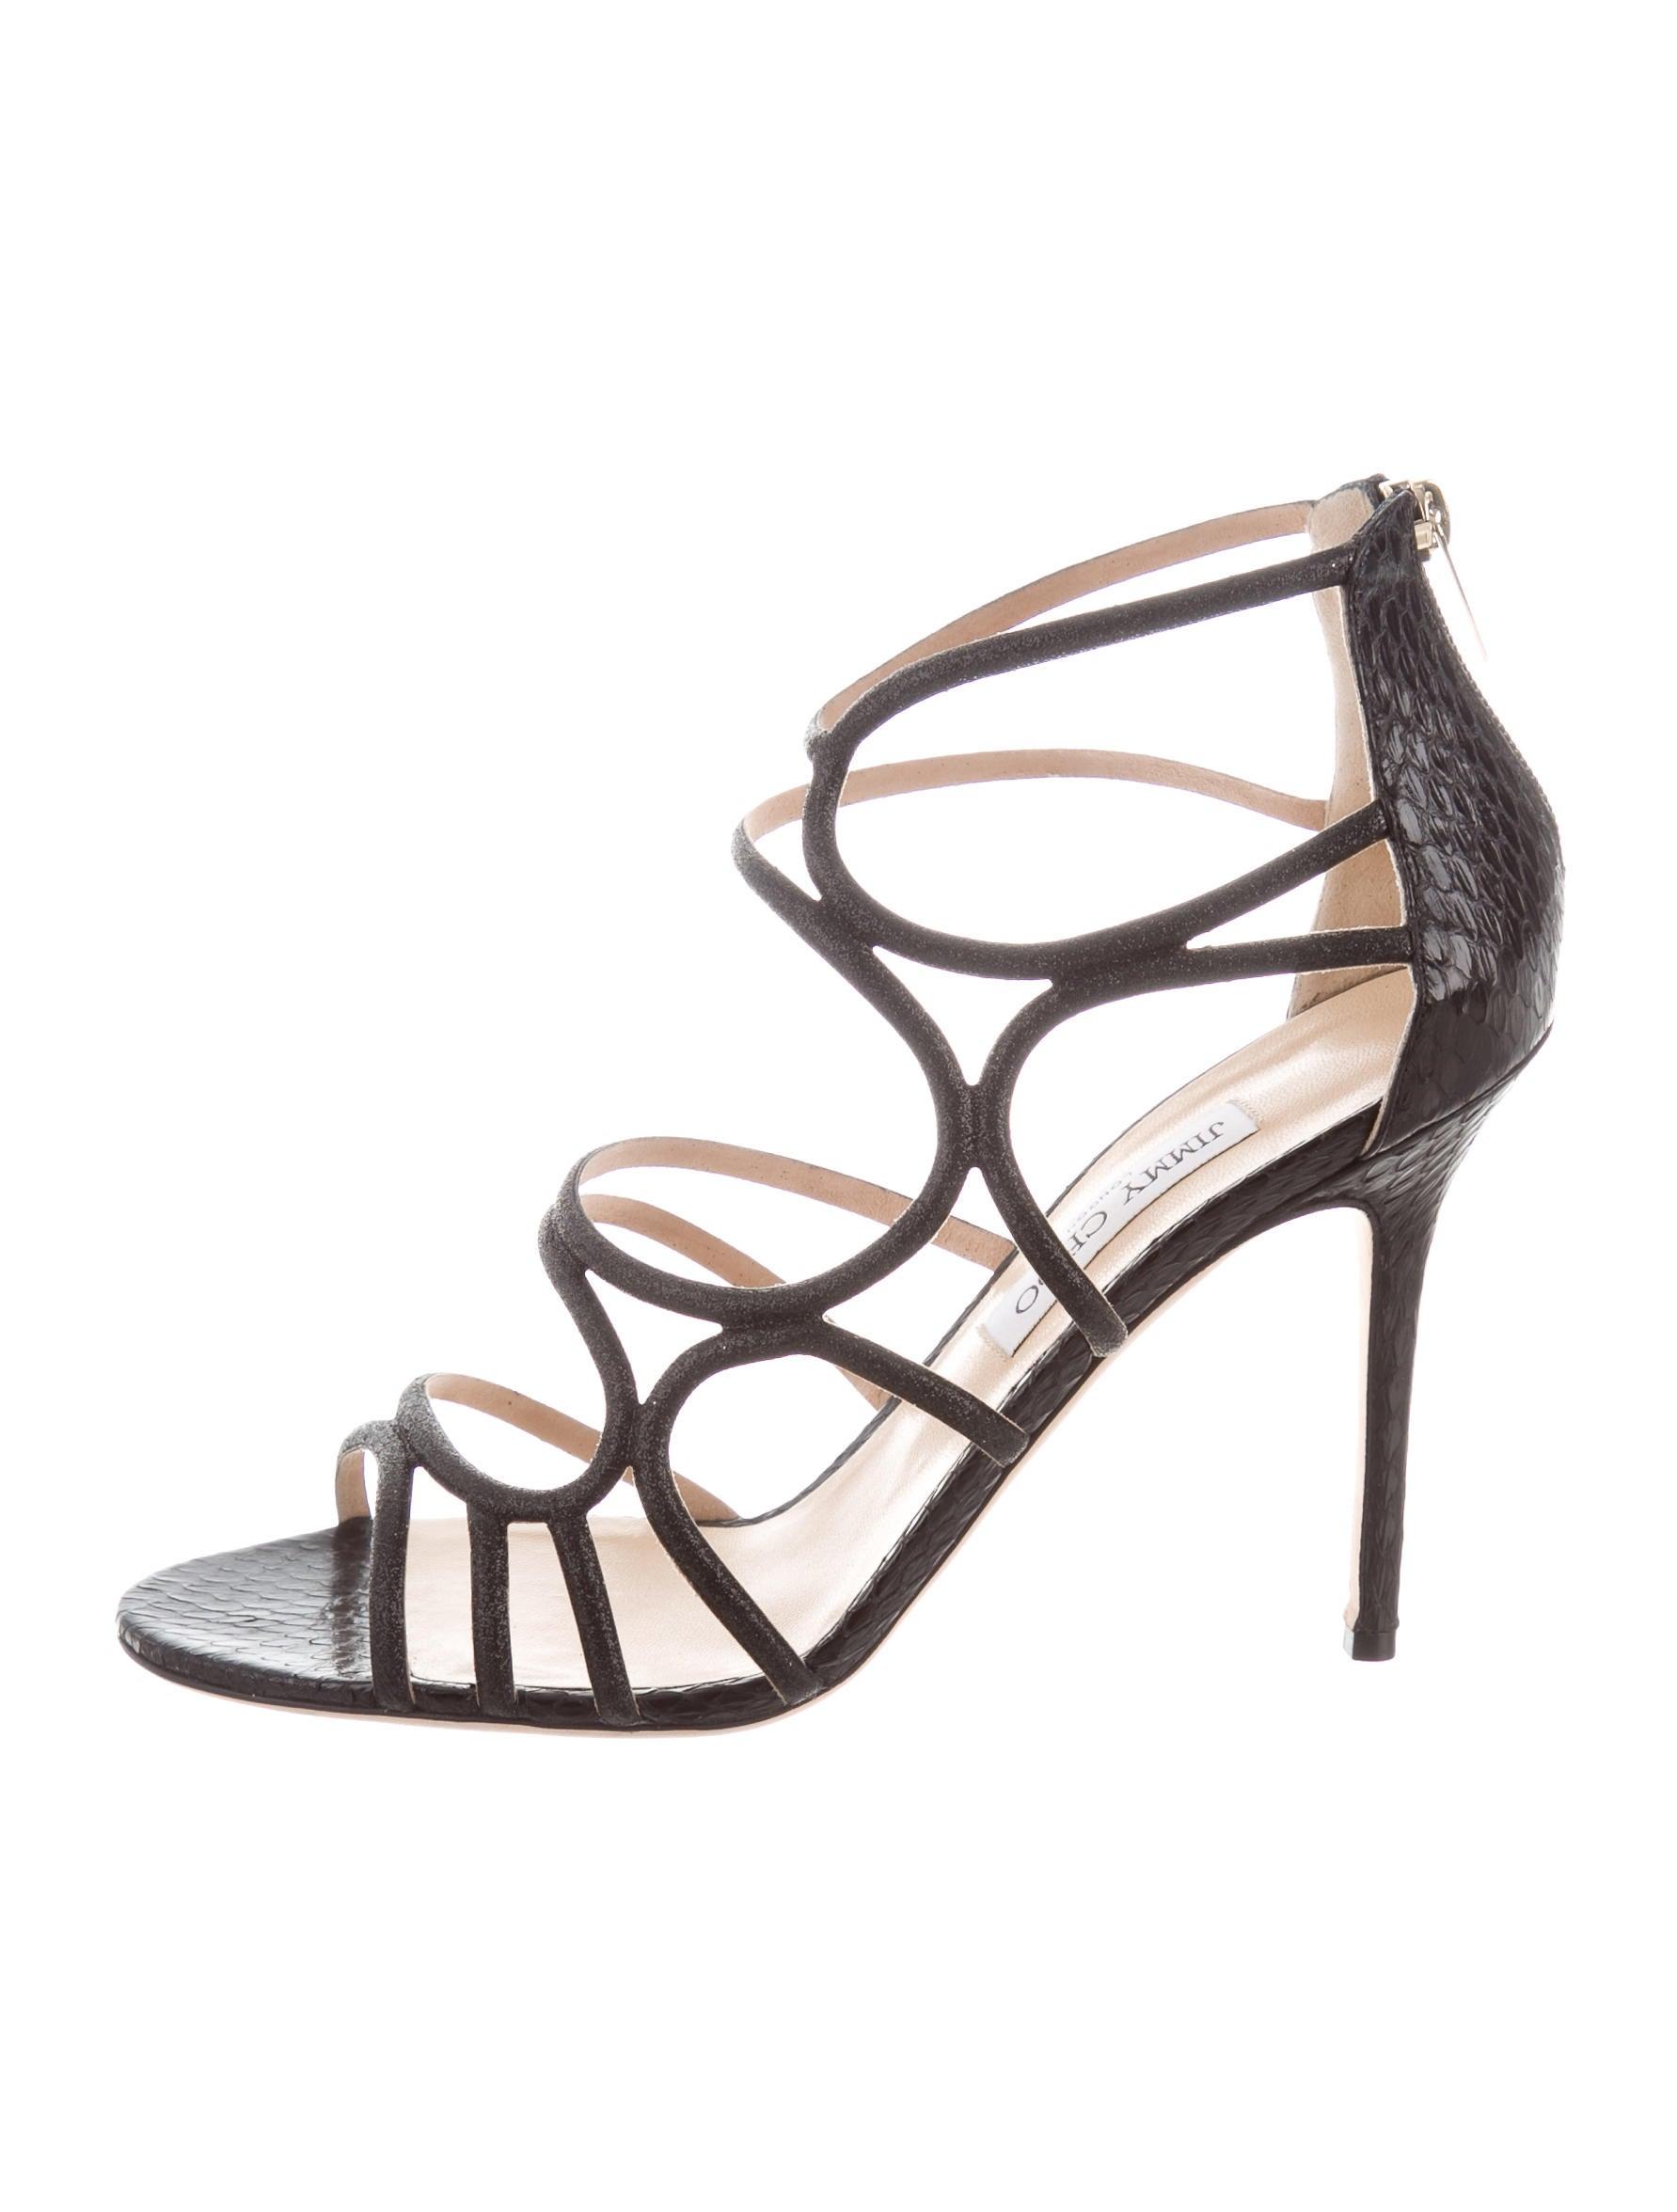 8d4e8cfddad7 Jimmy Choo Dory Snakeskin Cage Sandals - Shoes - JIM79348